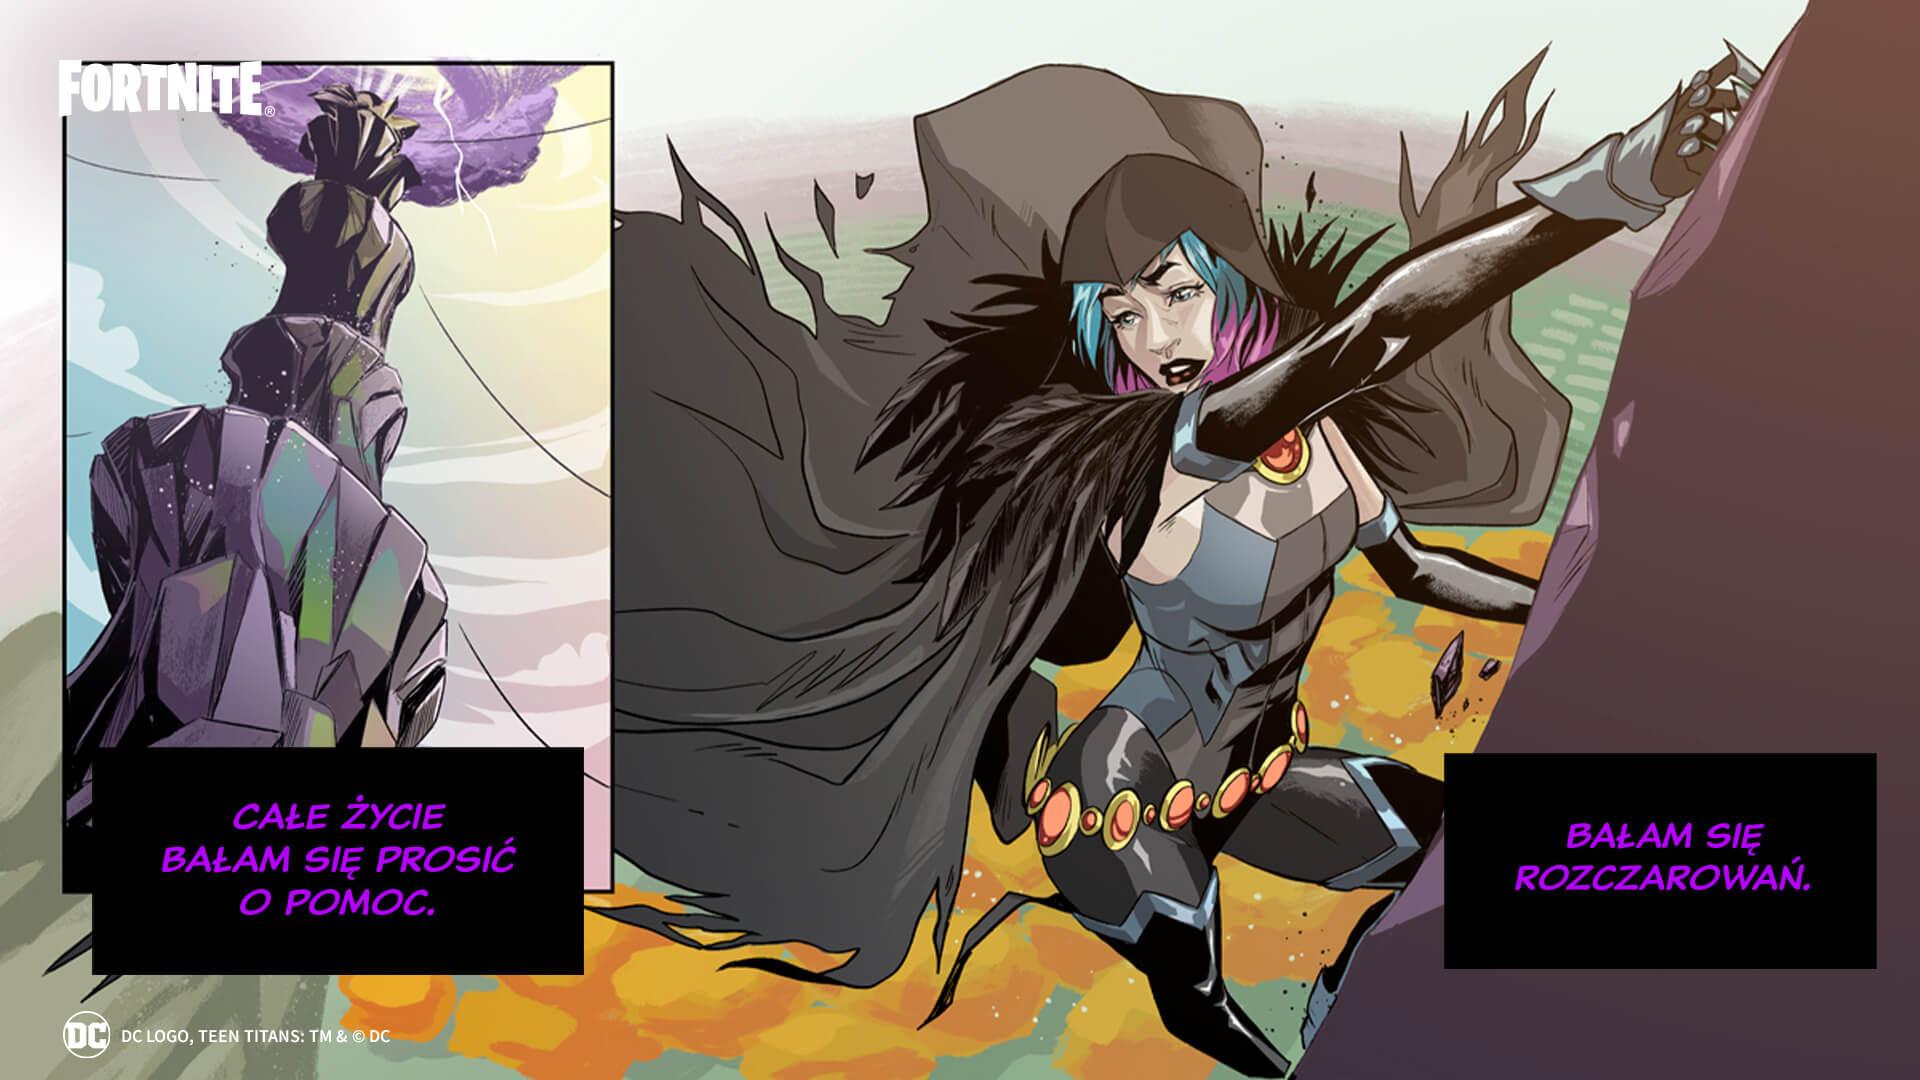 PL Raven BeastBoy S16 01 Social 1920x1080 1